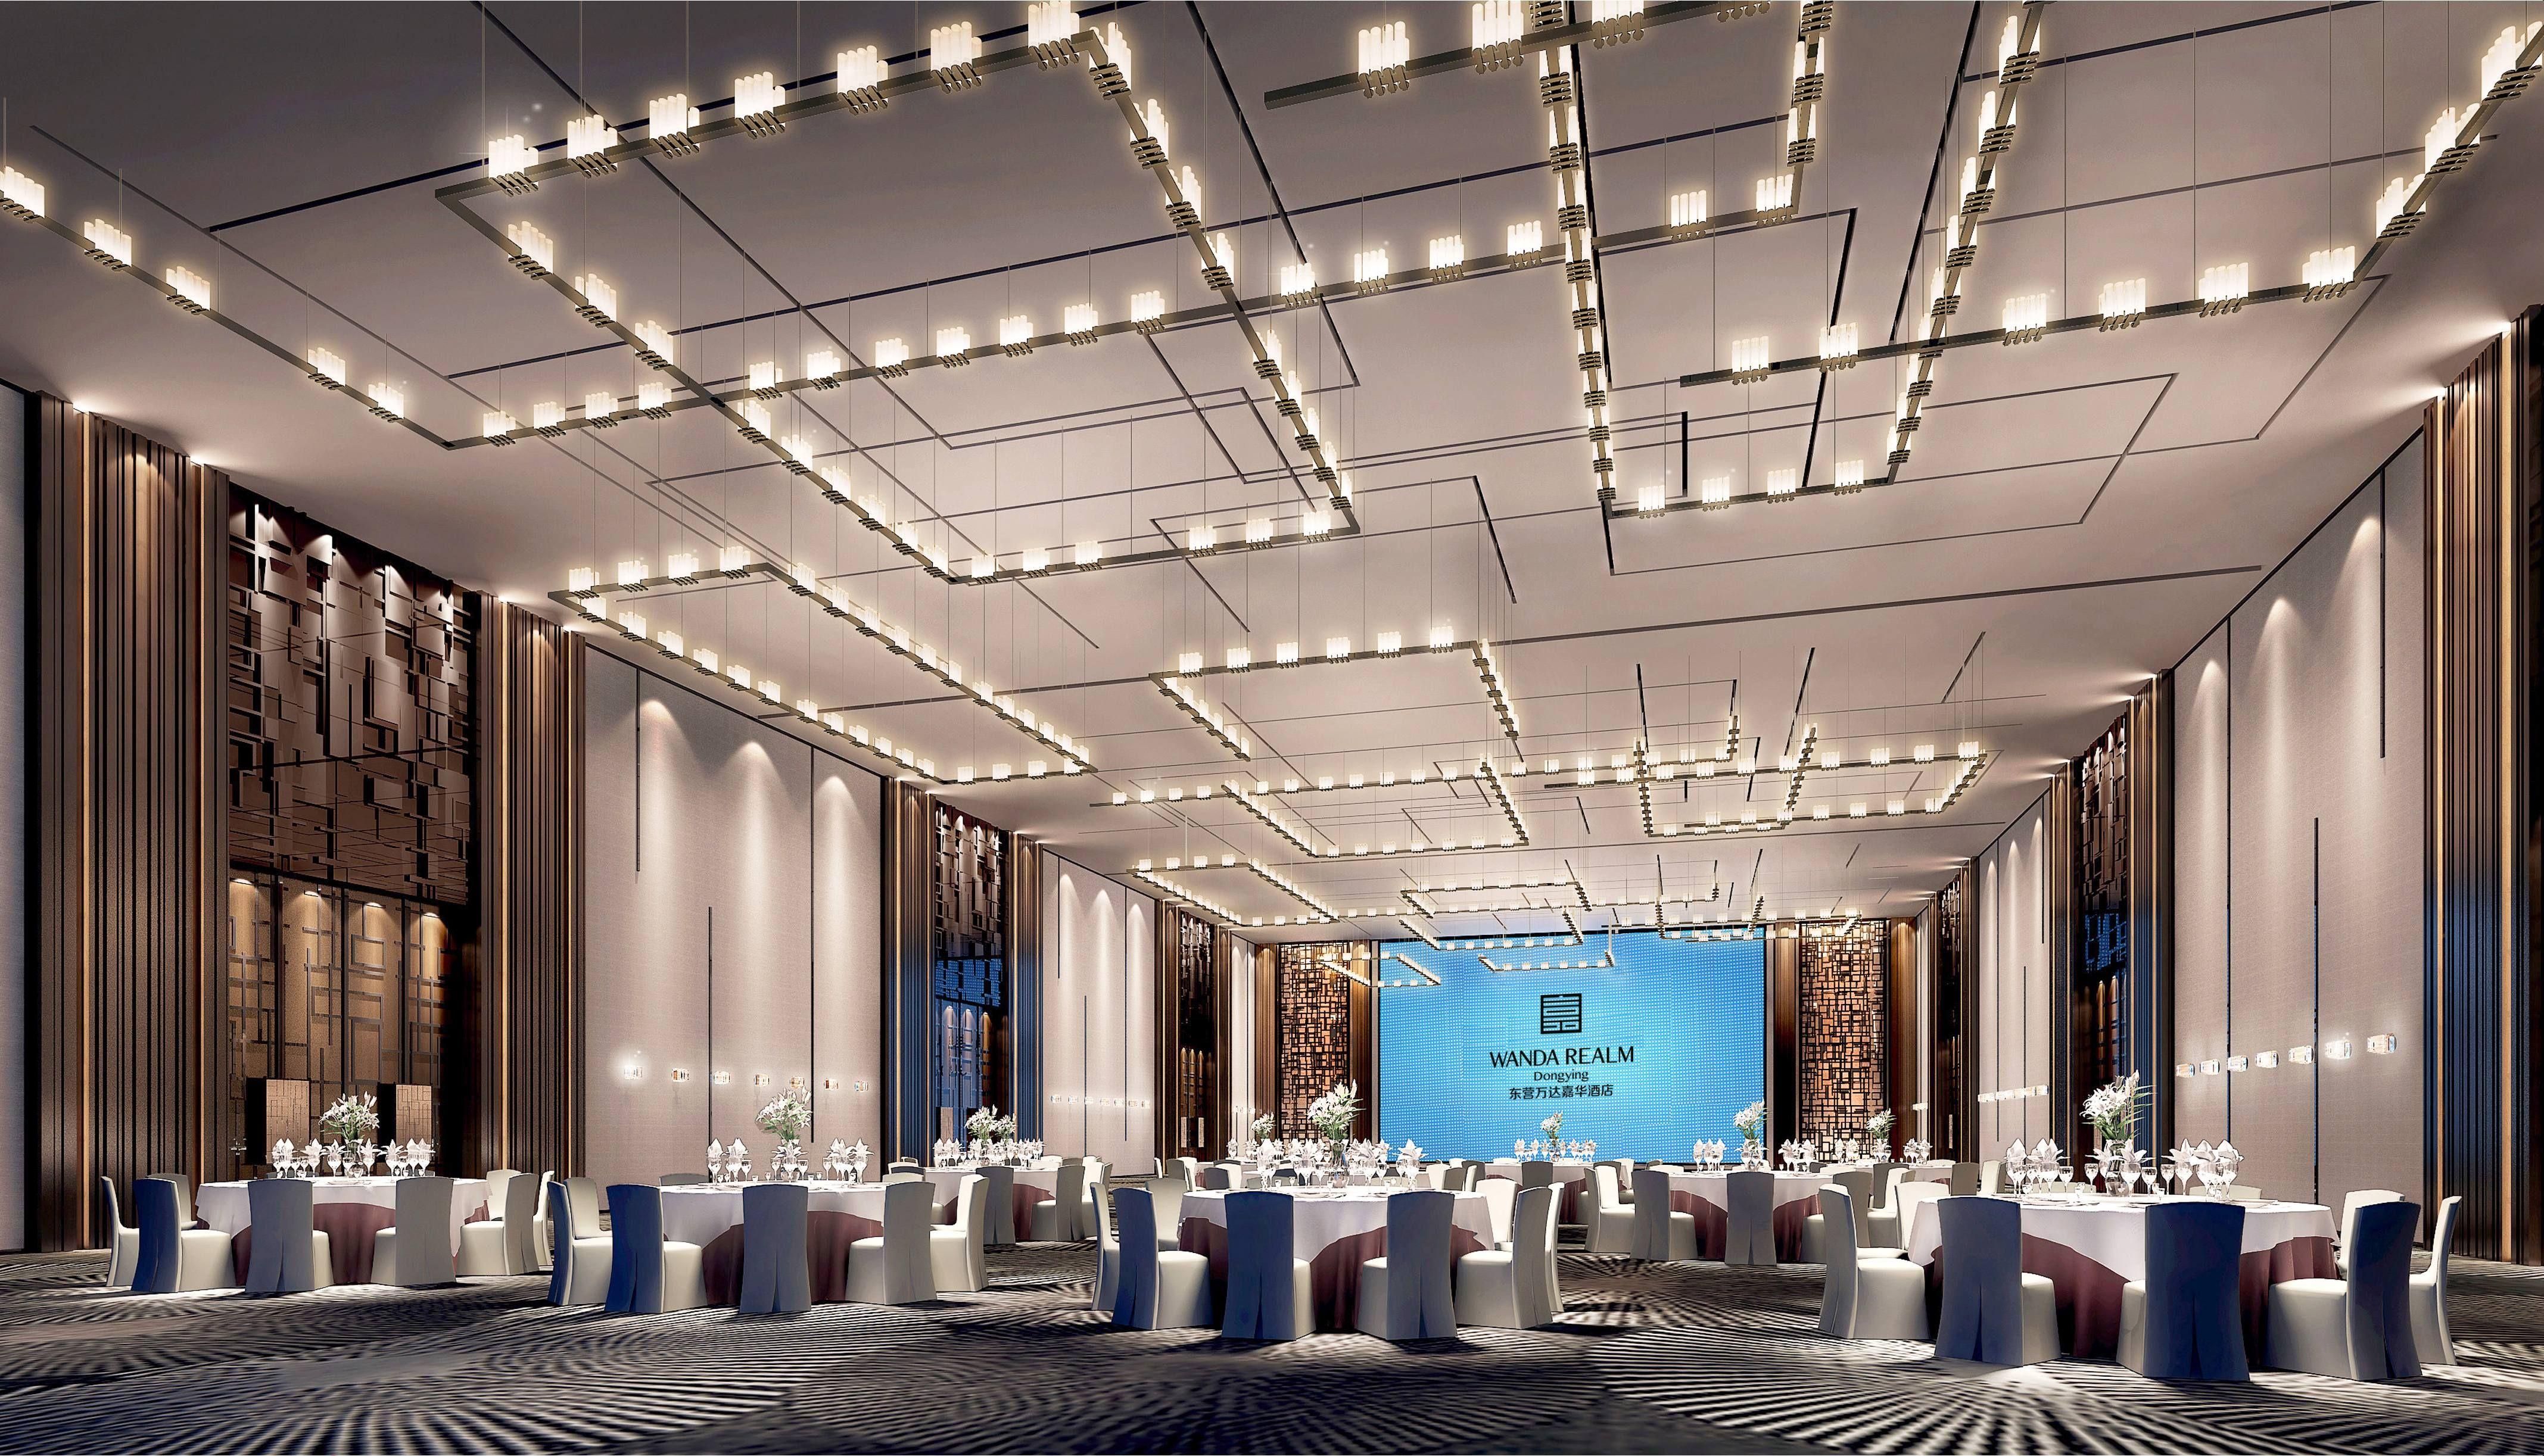 Wanda Hotels  U0026 Resorts Opens 76th Hotel In Dongying  China